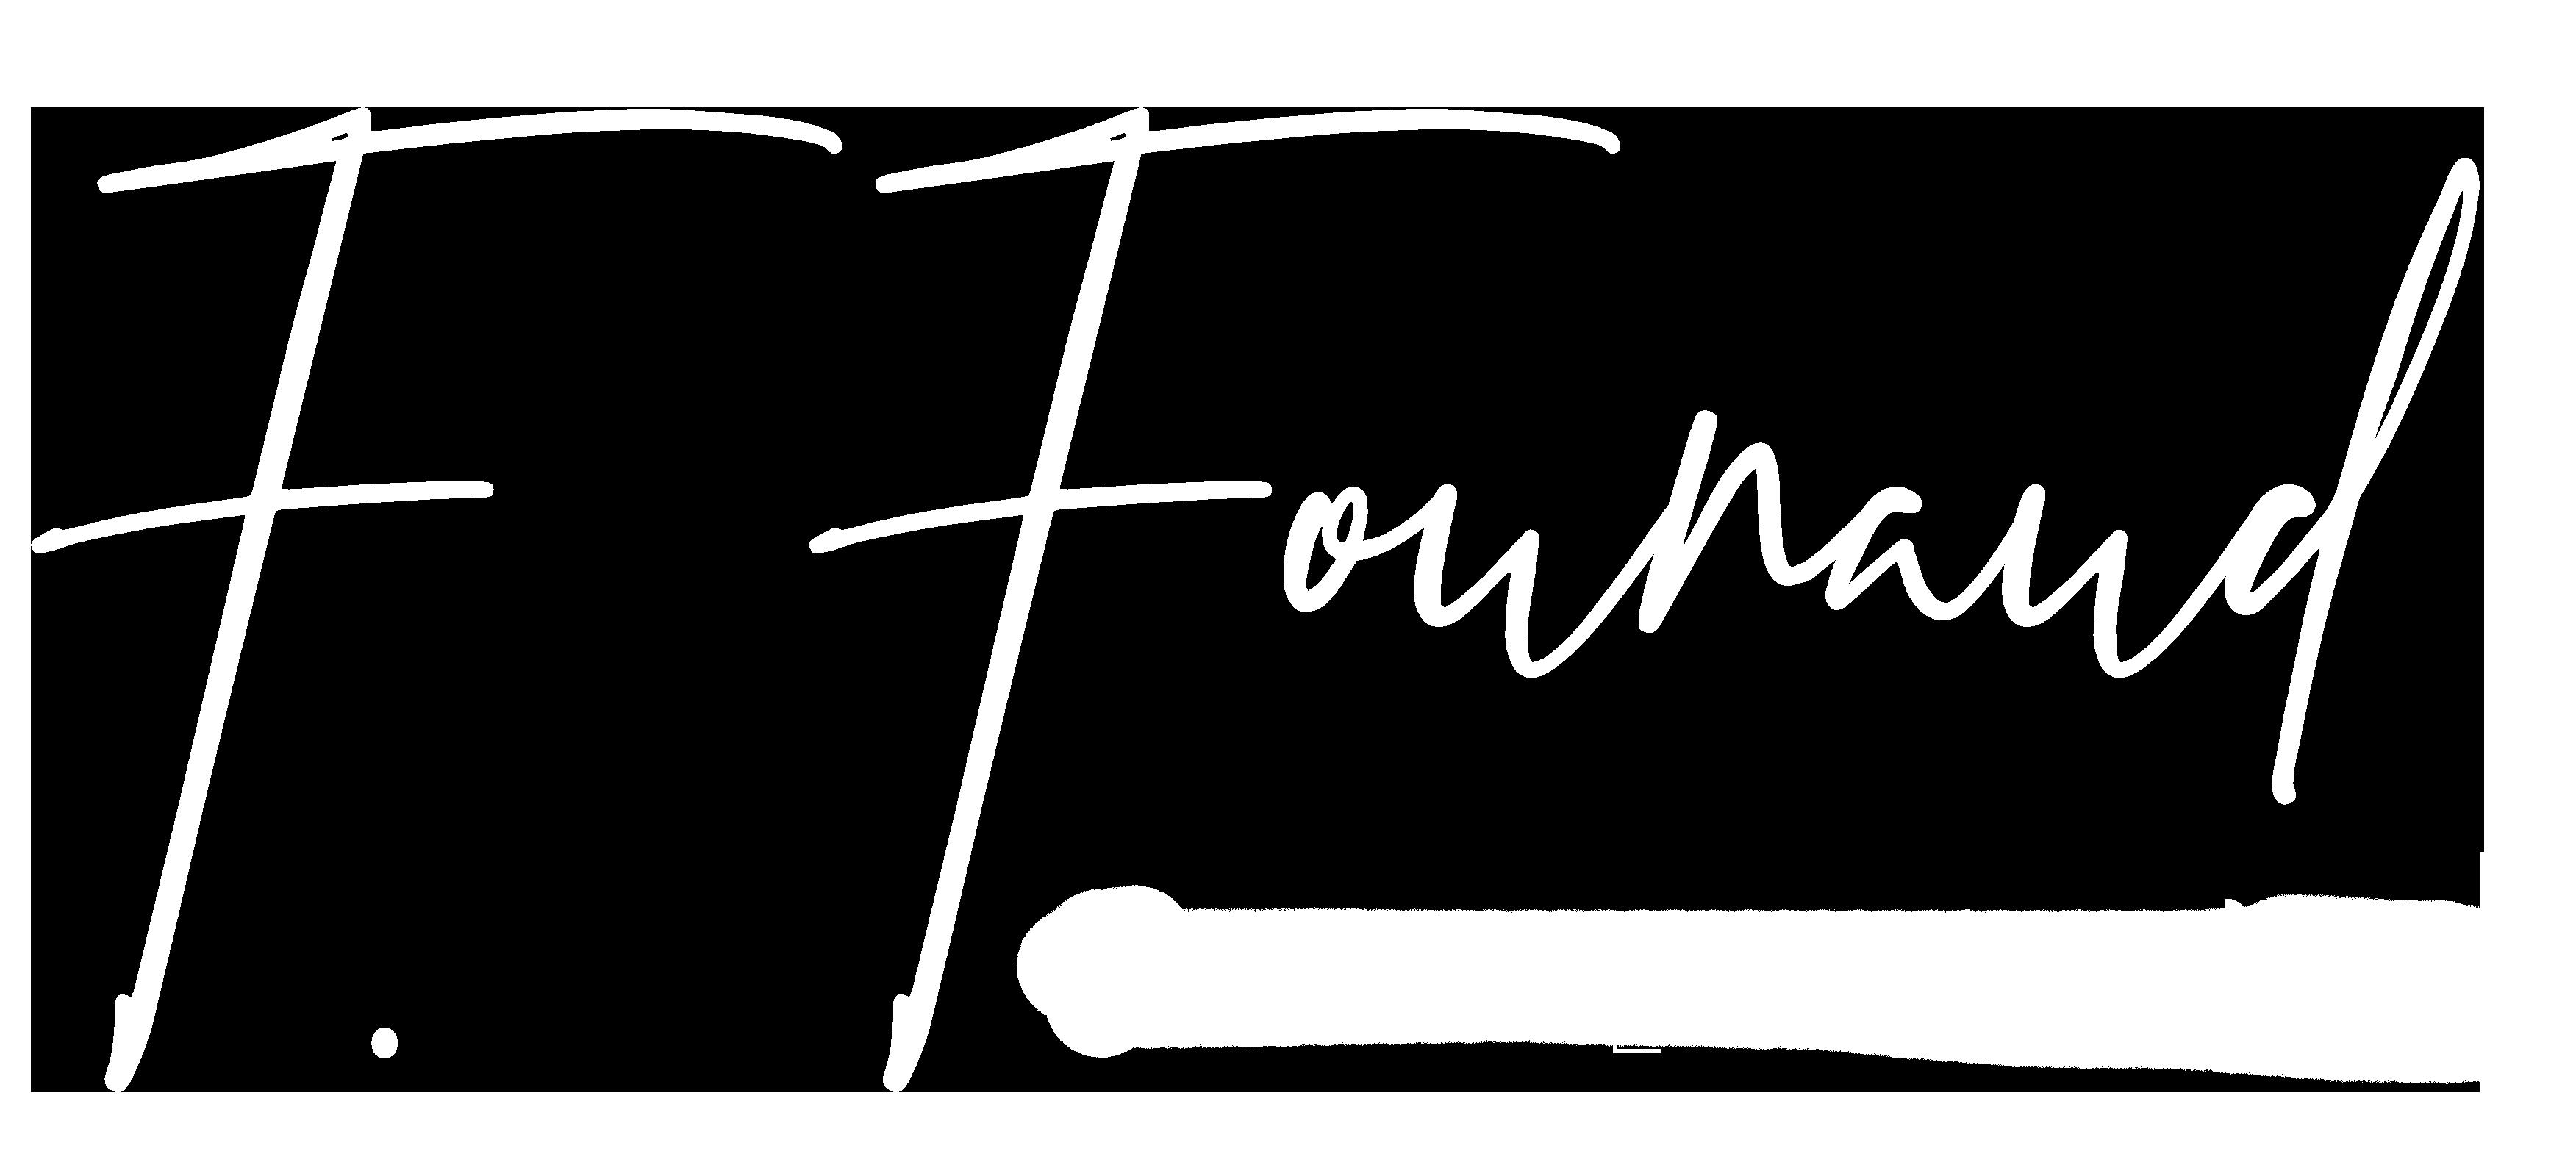 frederic founaud